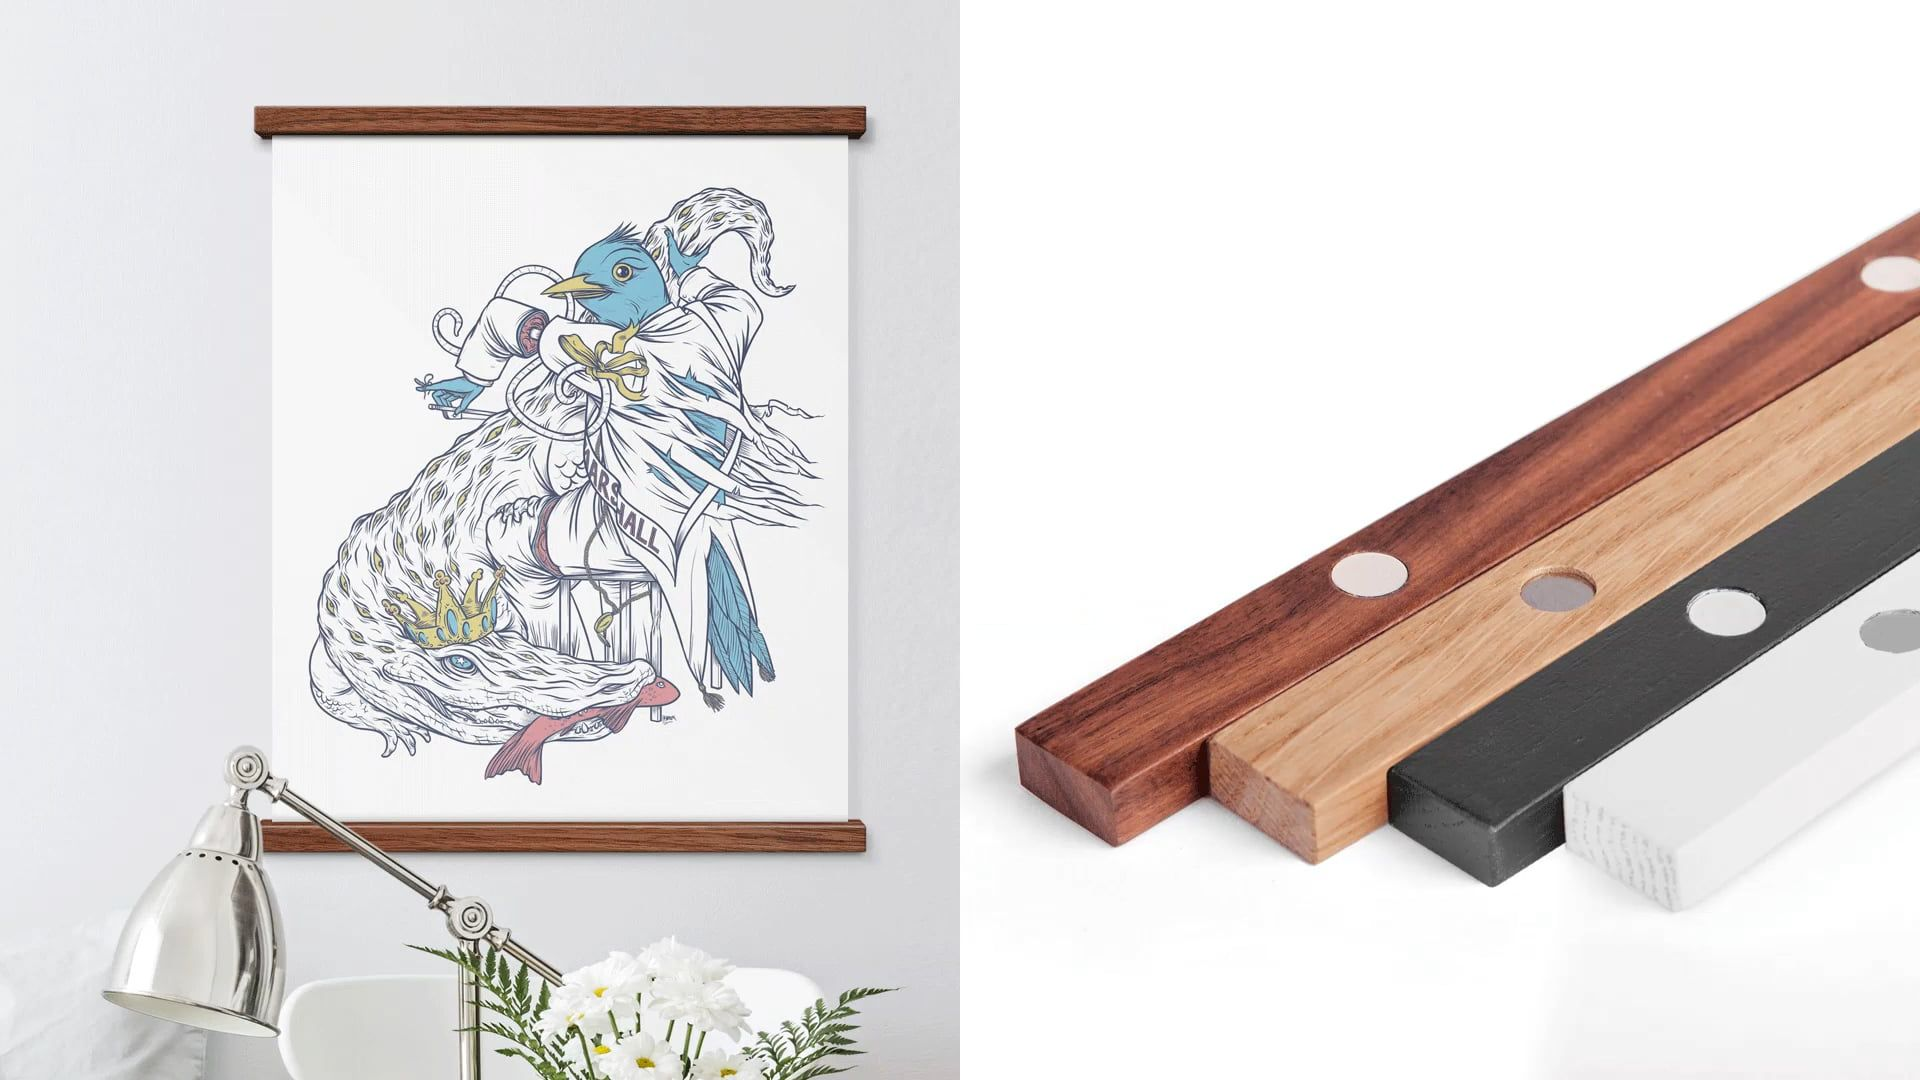 Poster Hangers Solid Wood 좋은 아이디어, 아이디어